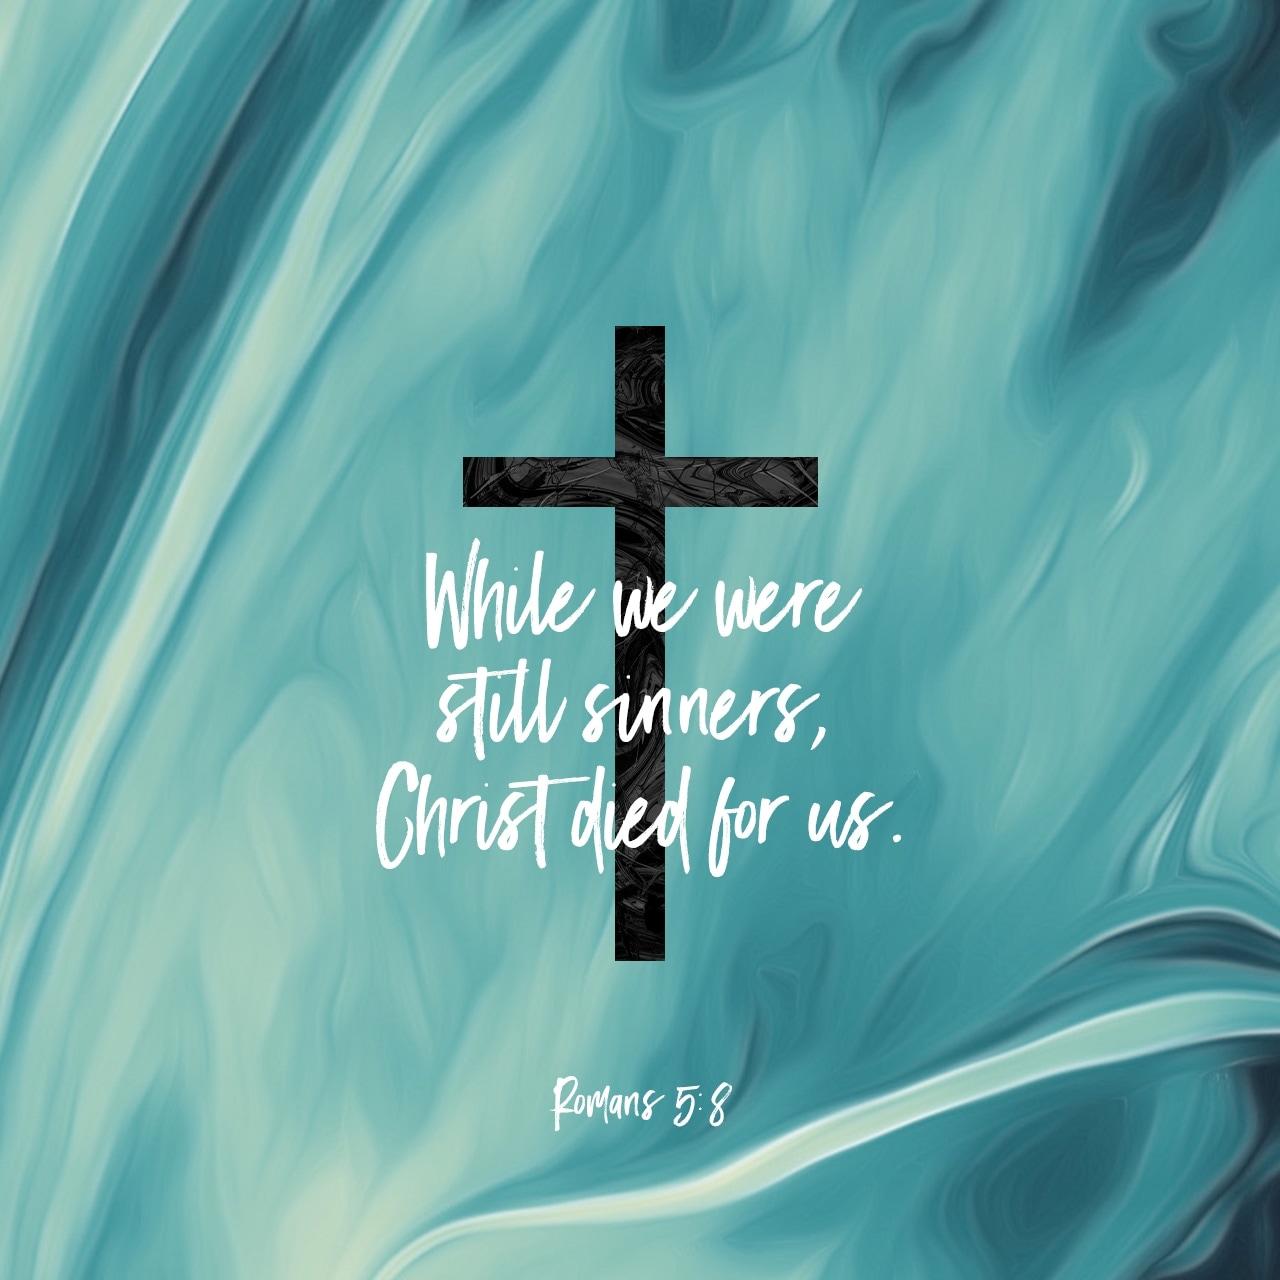 Romans 5:8 (JPG)